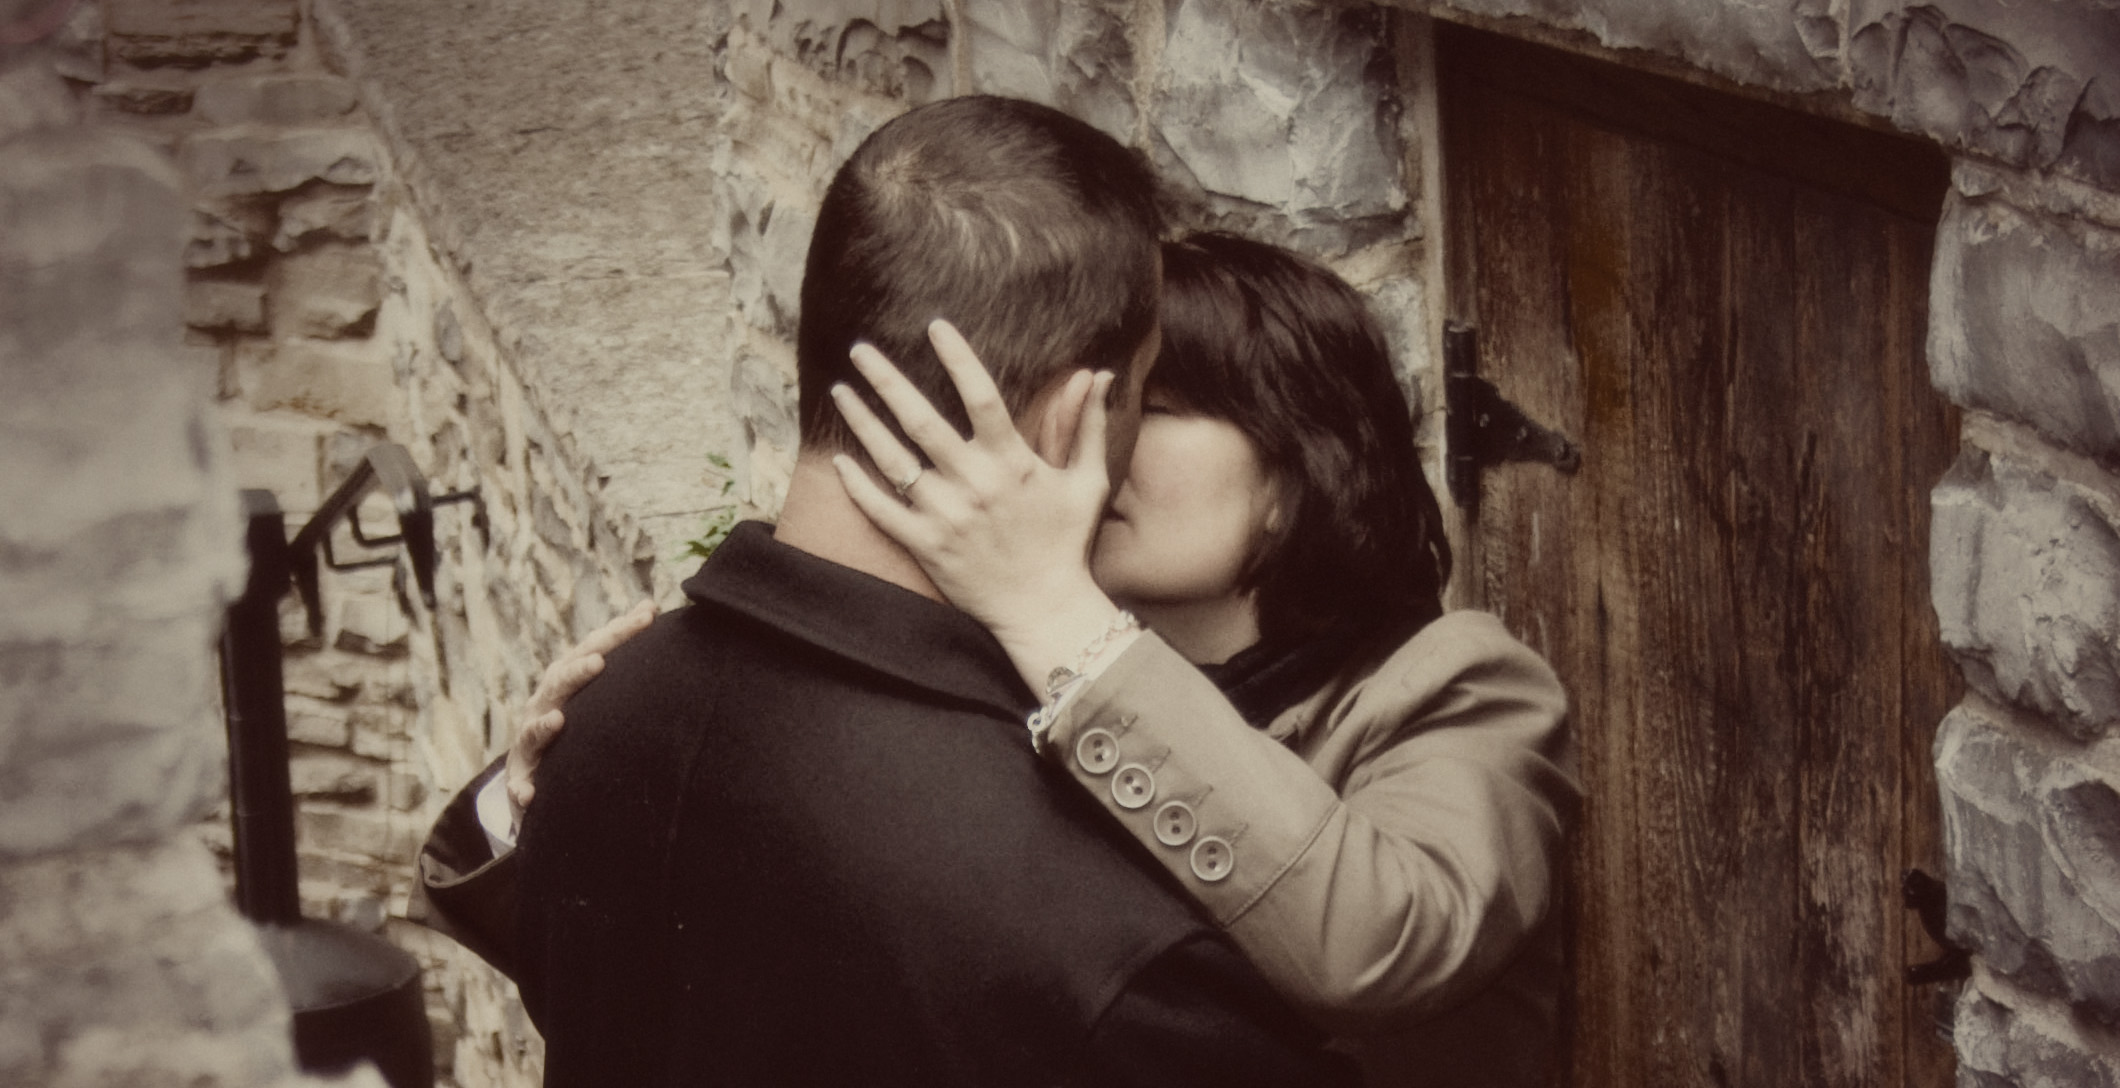 Crop kiss